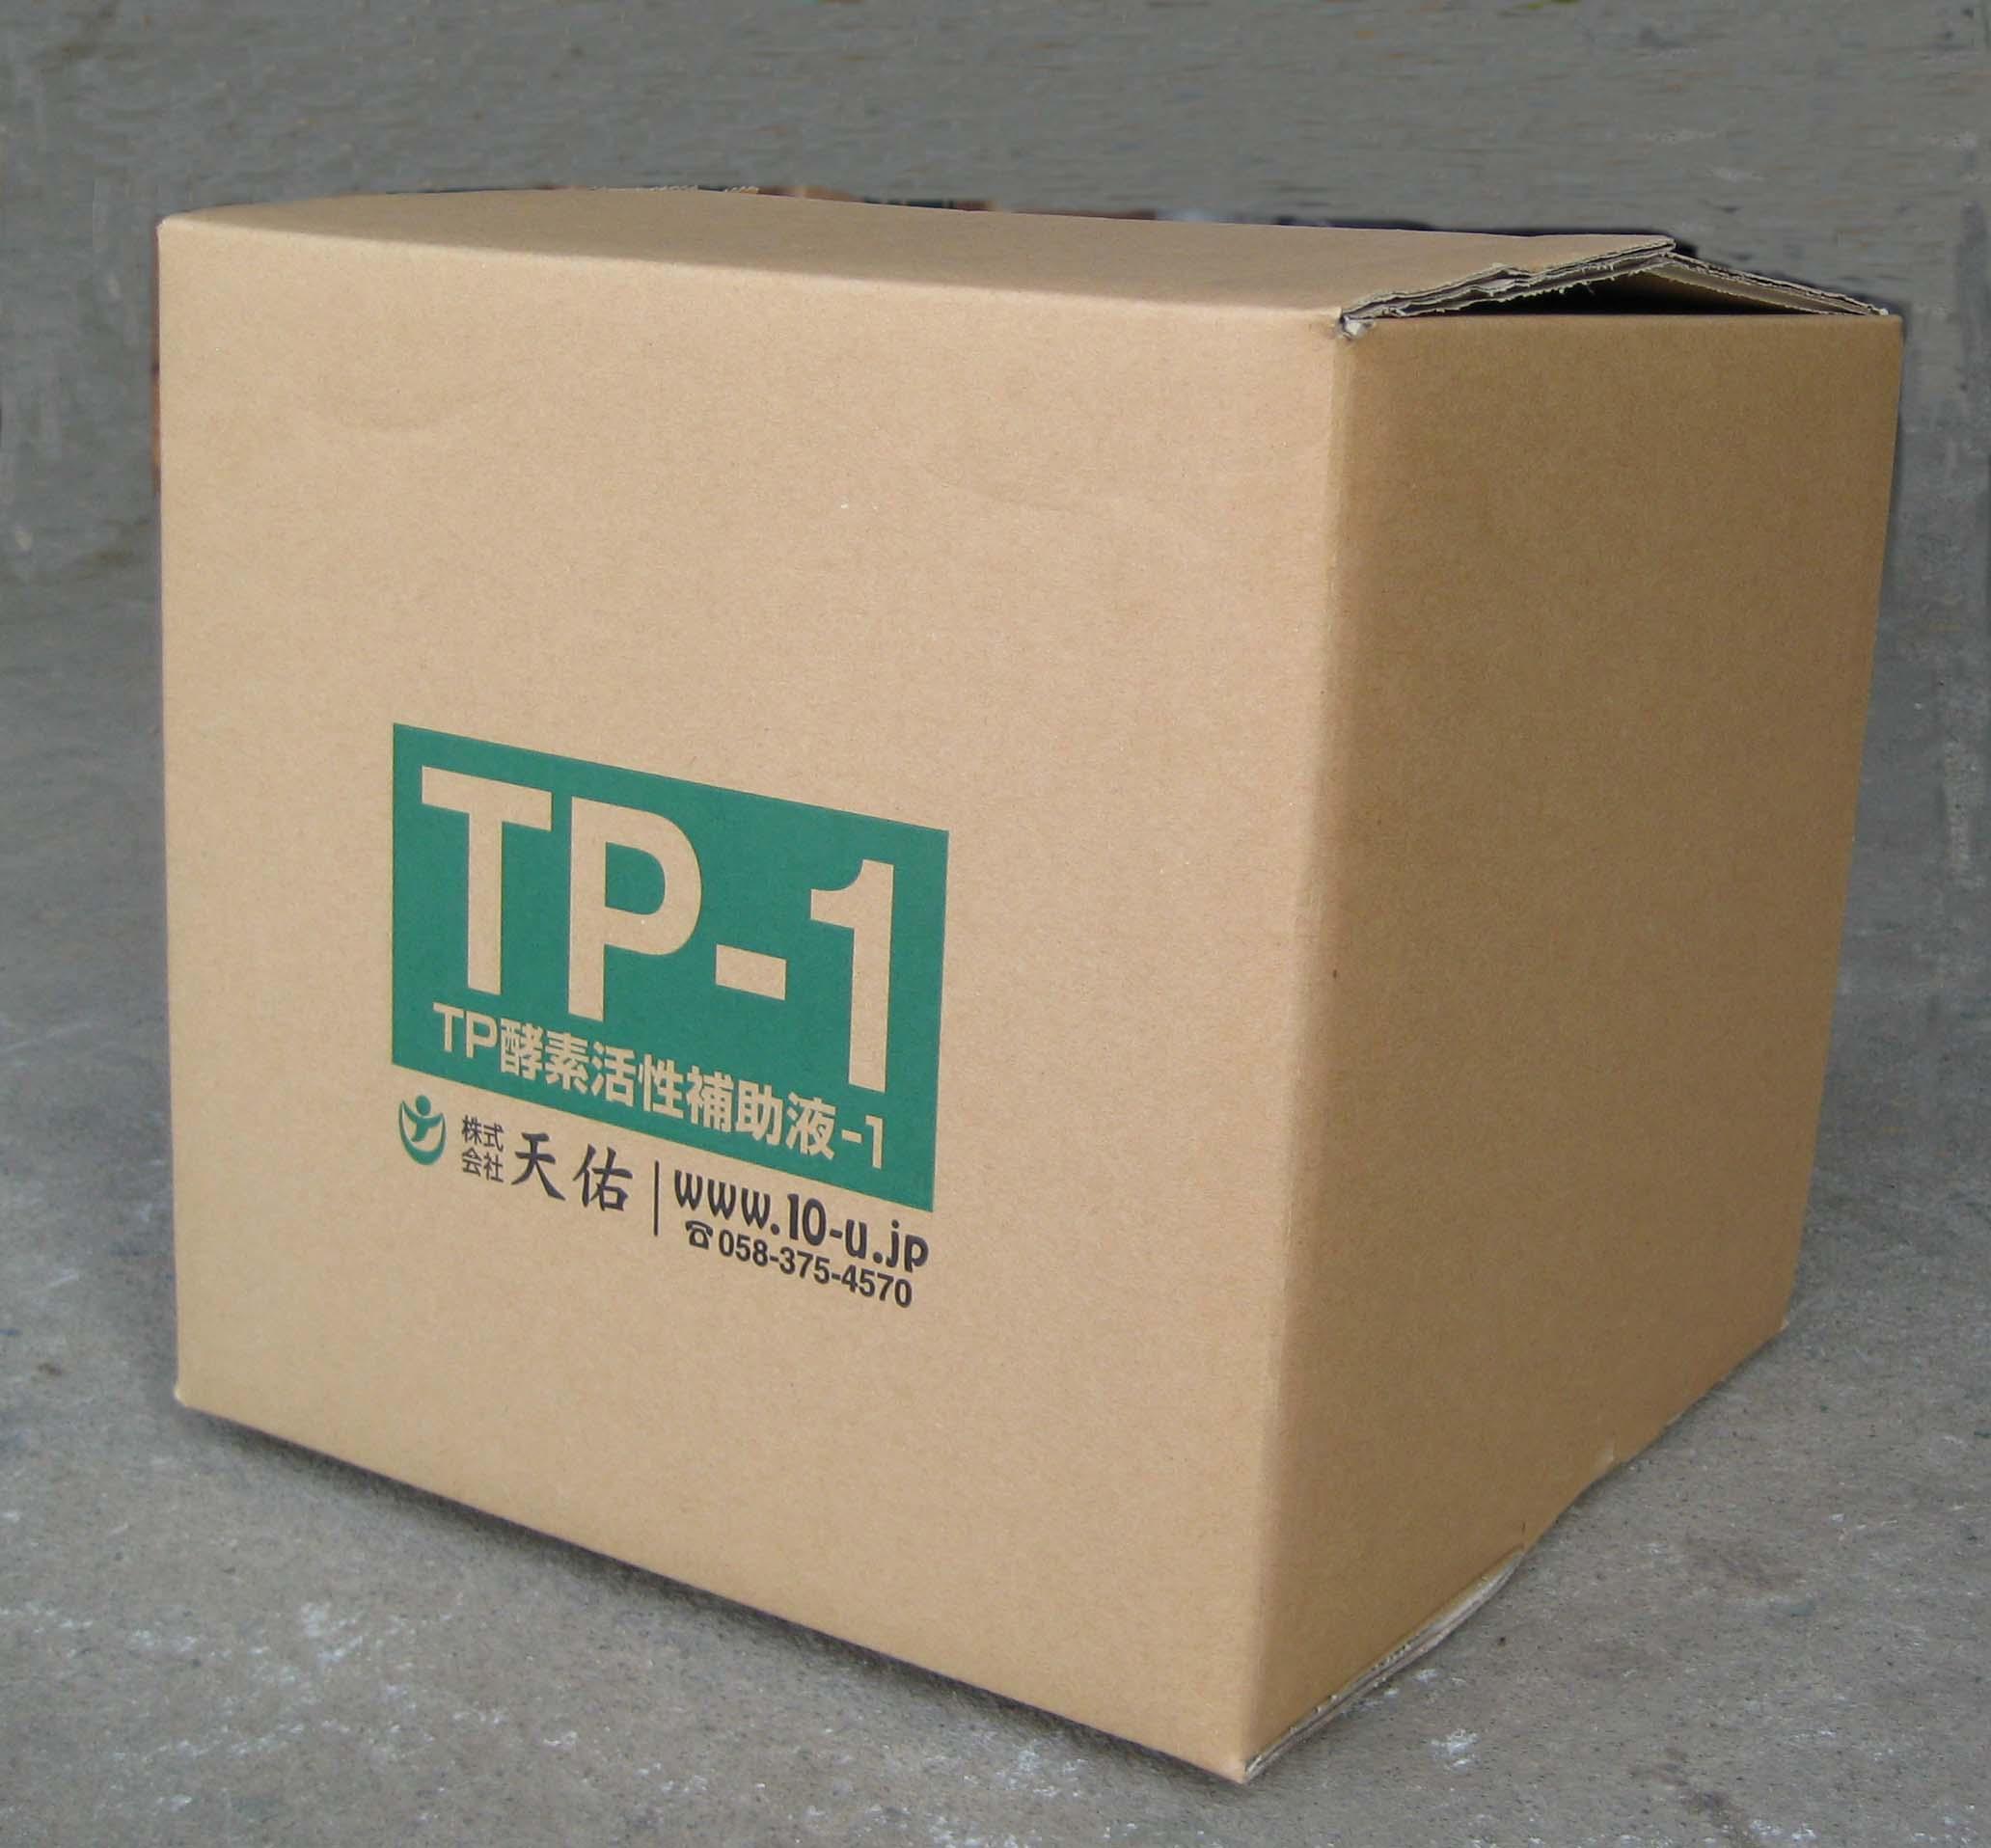 TP-1 (酵素活性補助液)